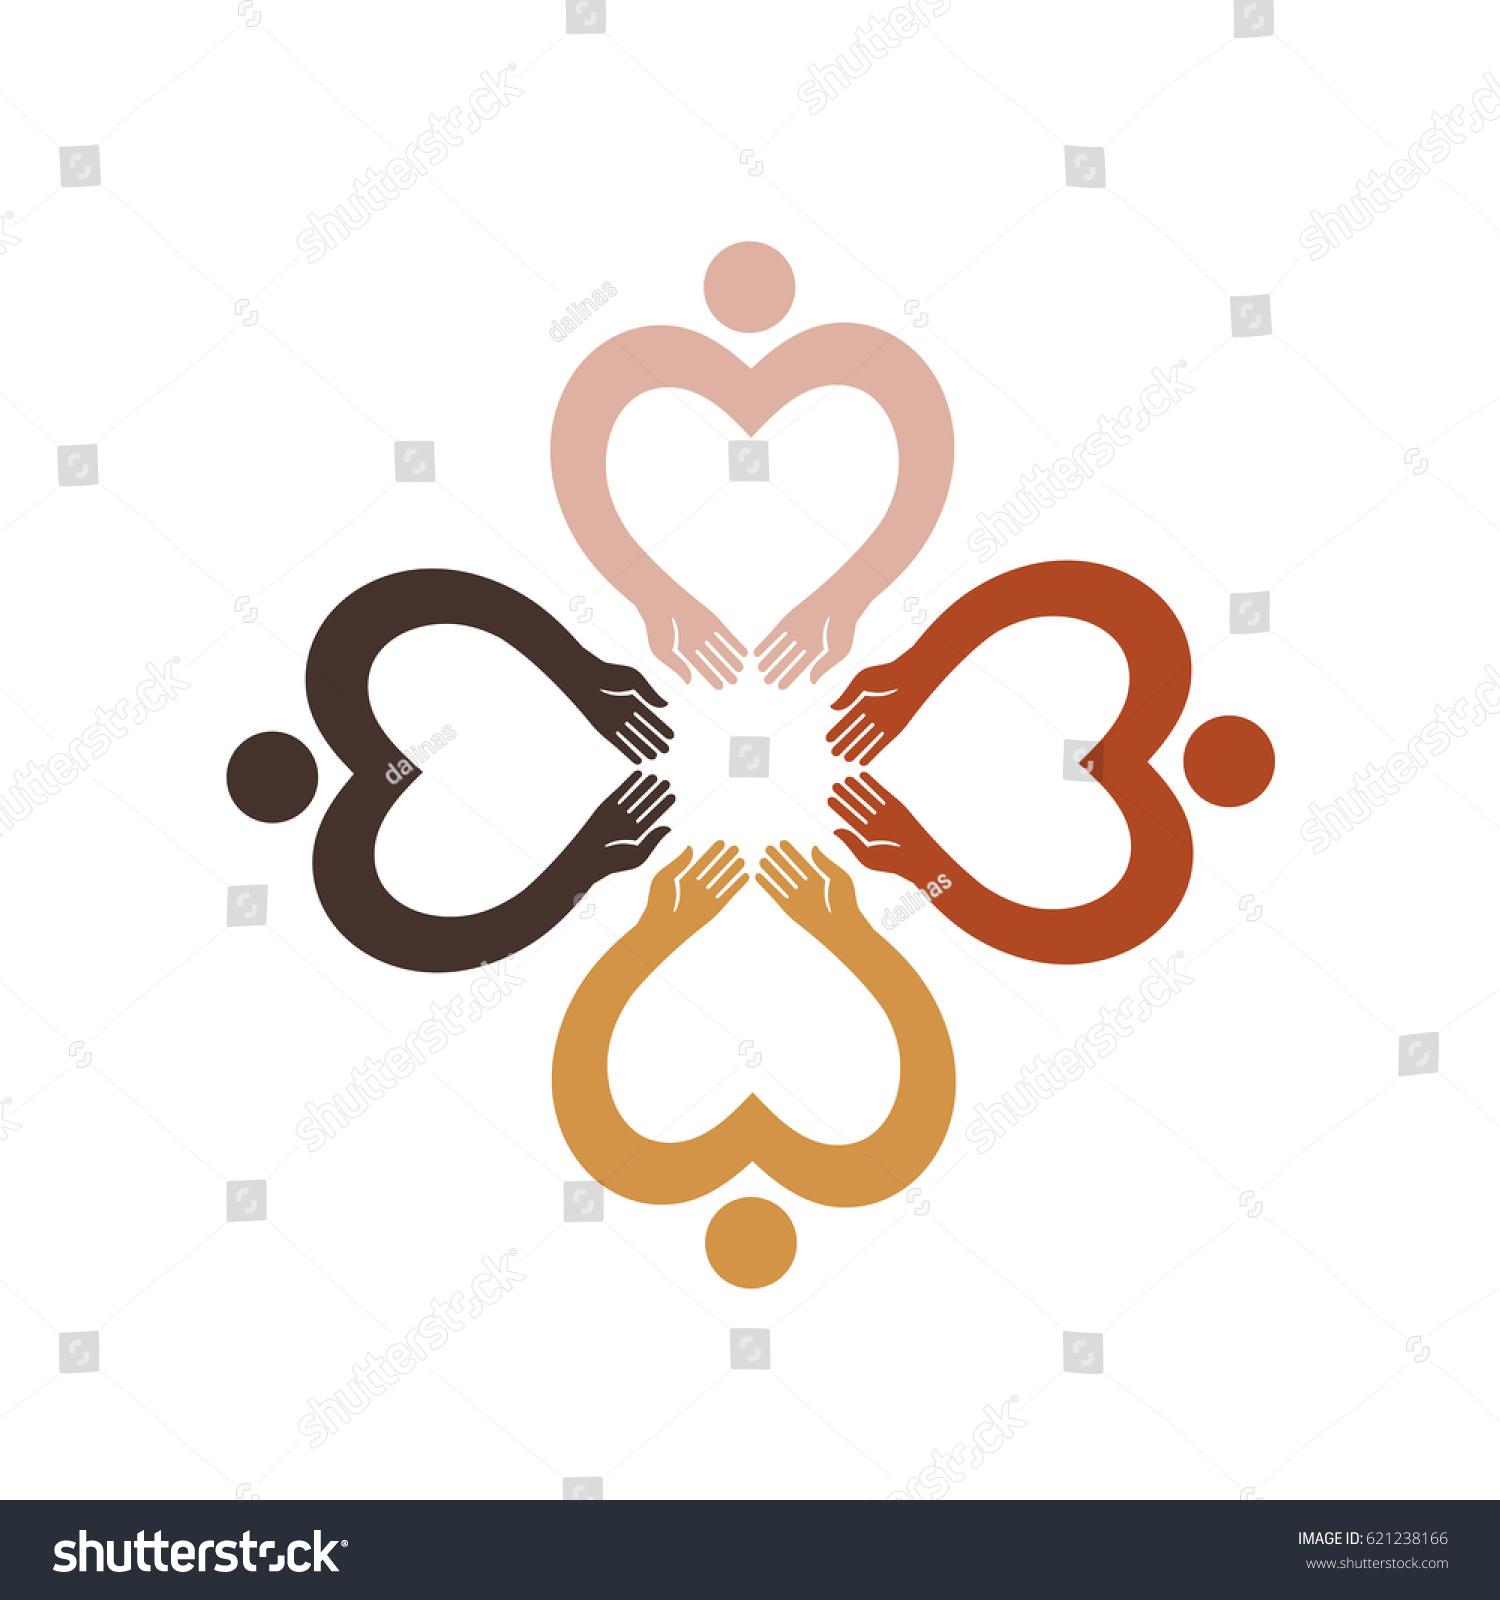 Flower quatrefoil composed four human figures stock vector flower quatrefoil composed of four human figures with different skin color vector icon symbol biocorpaavc Image collections